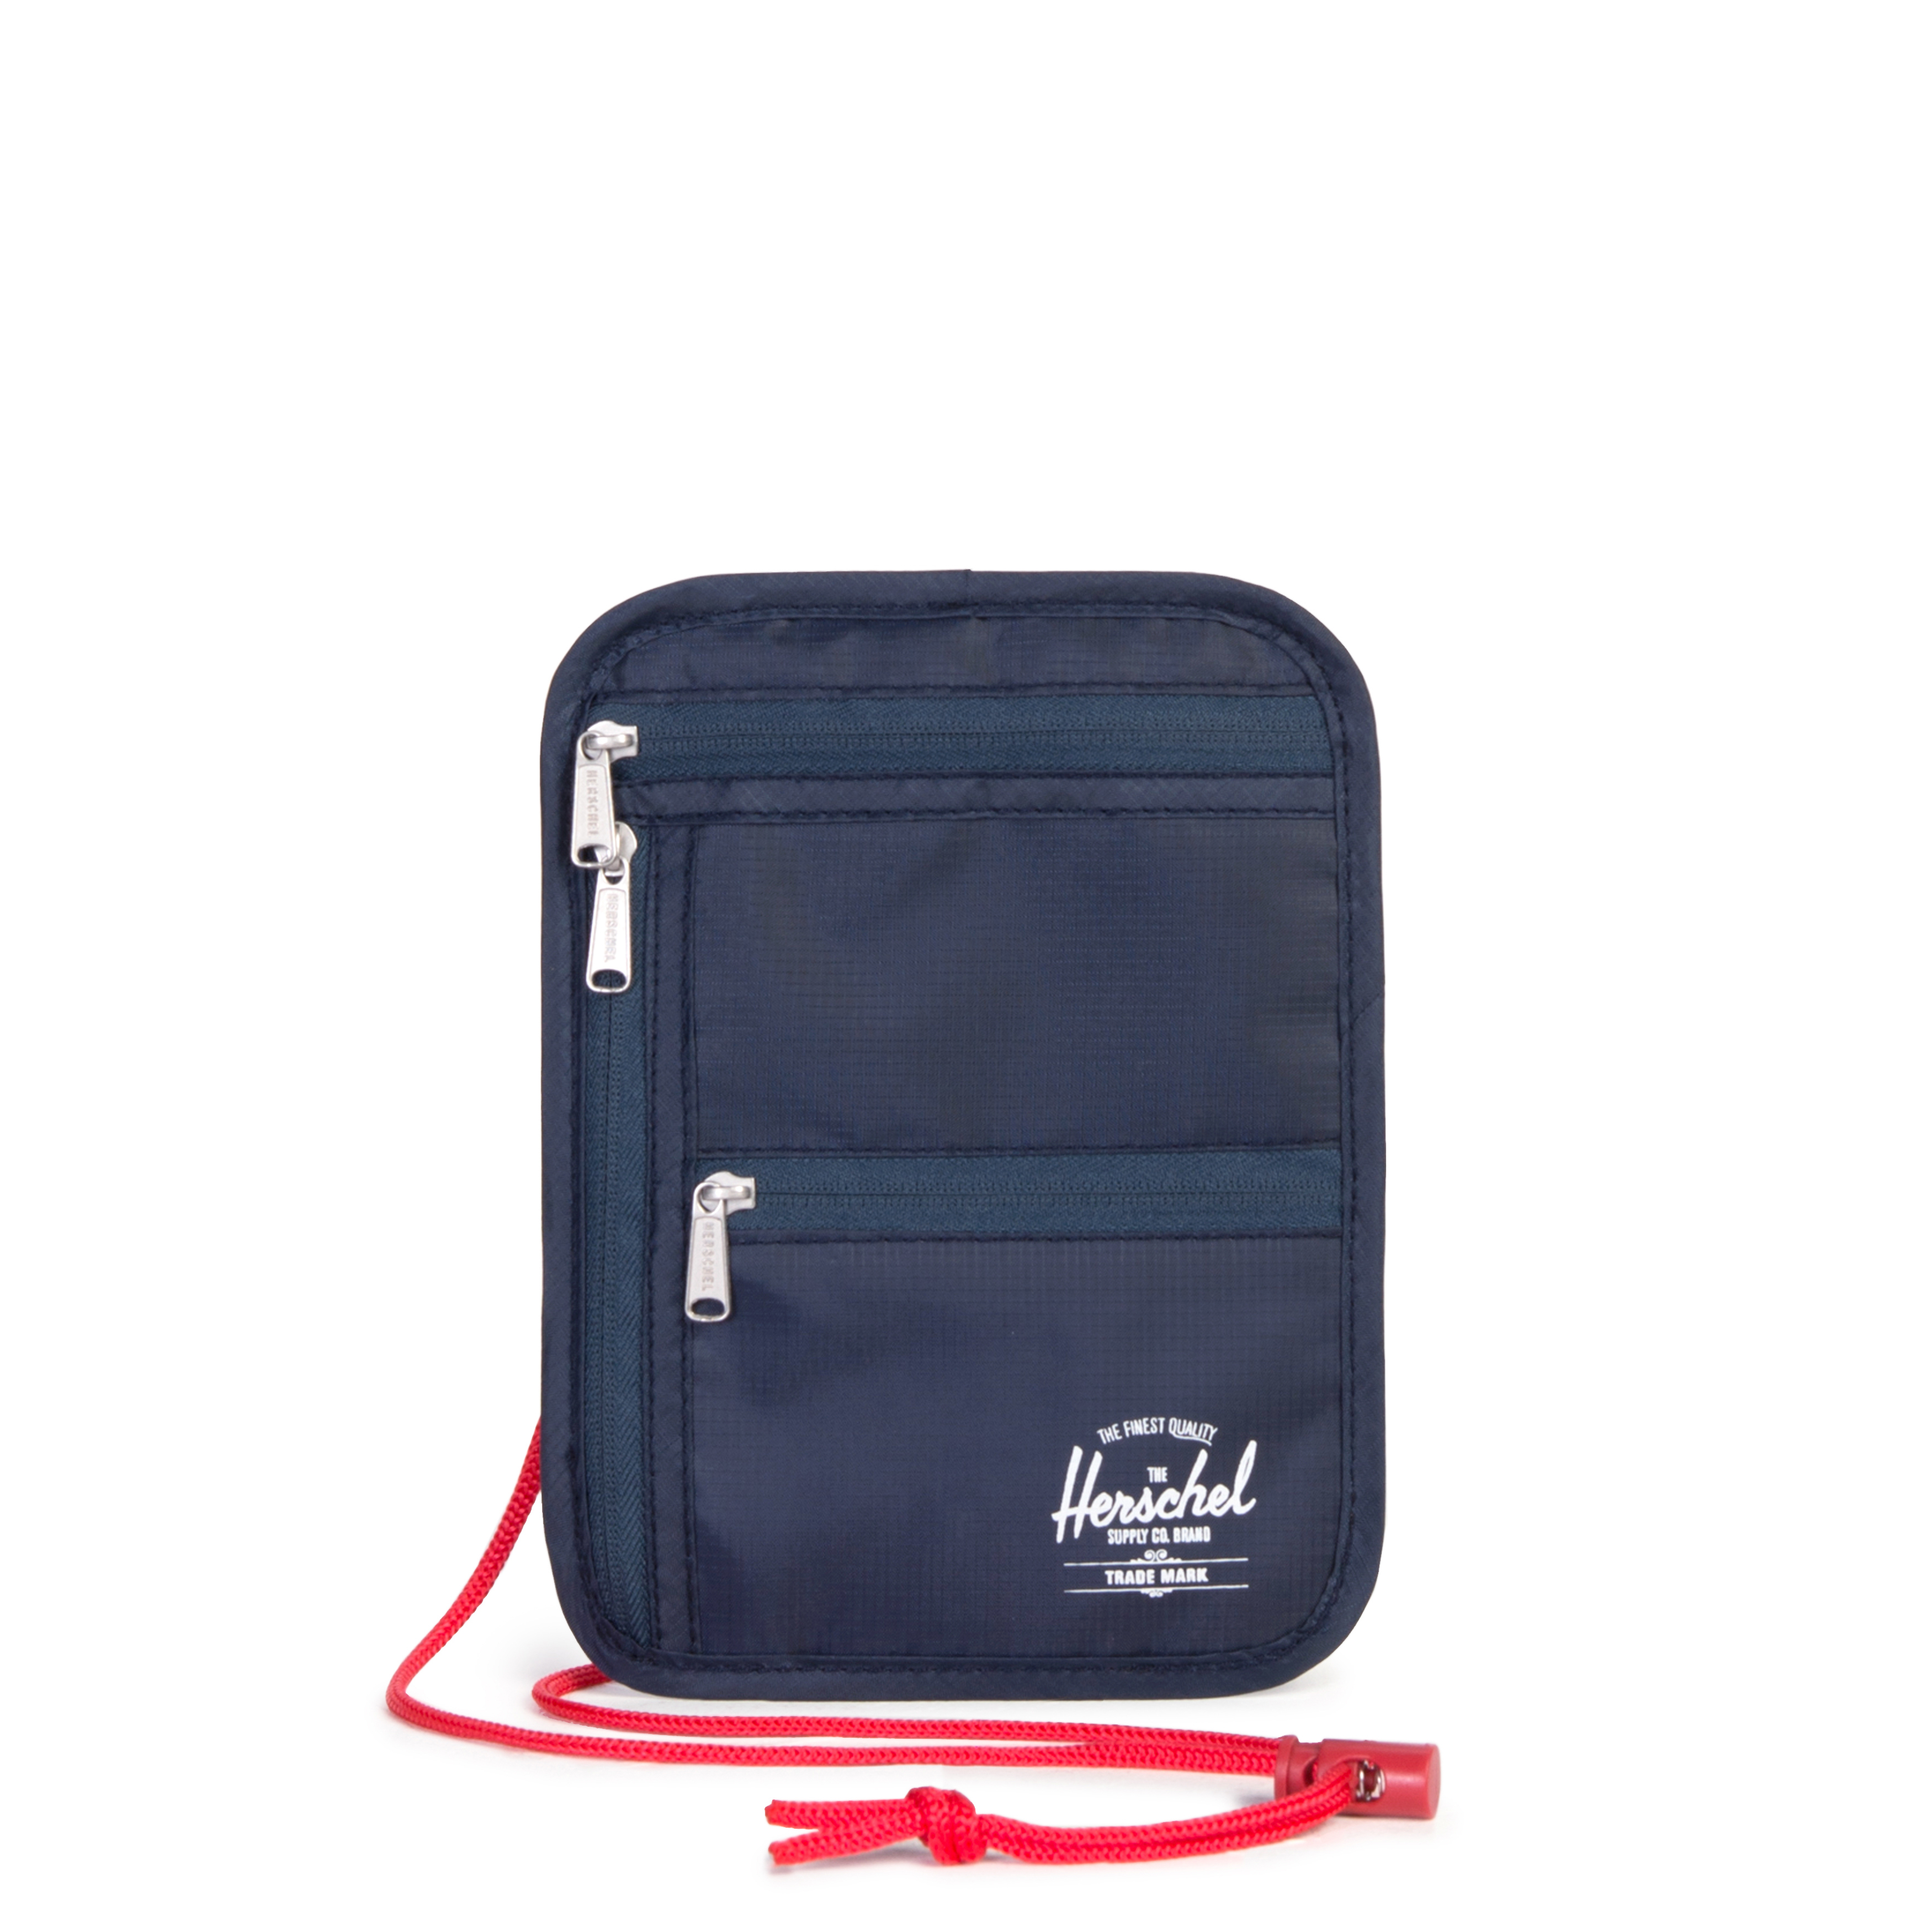 b619e612f Money Pouch | Herschel Supply Company